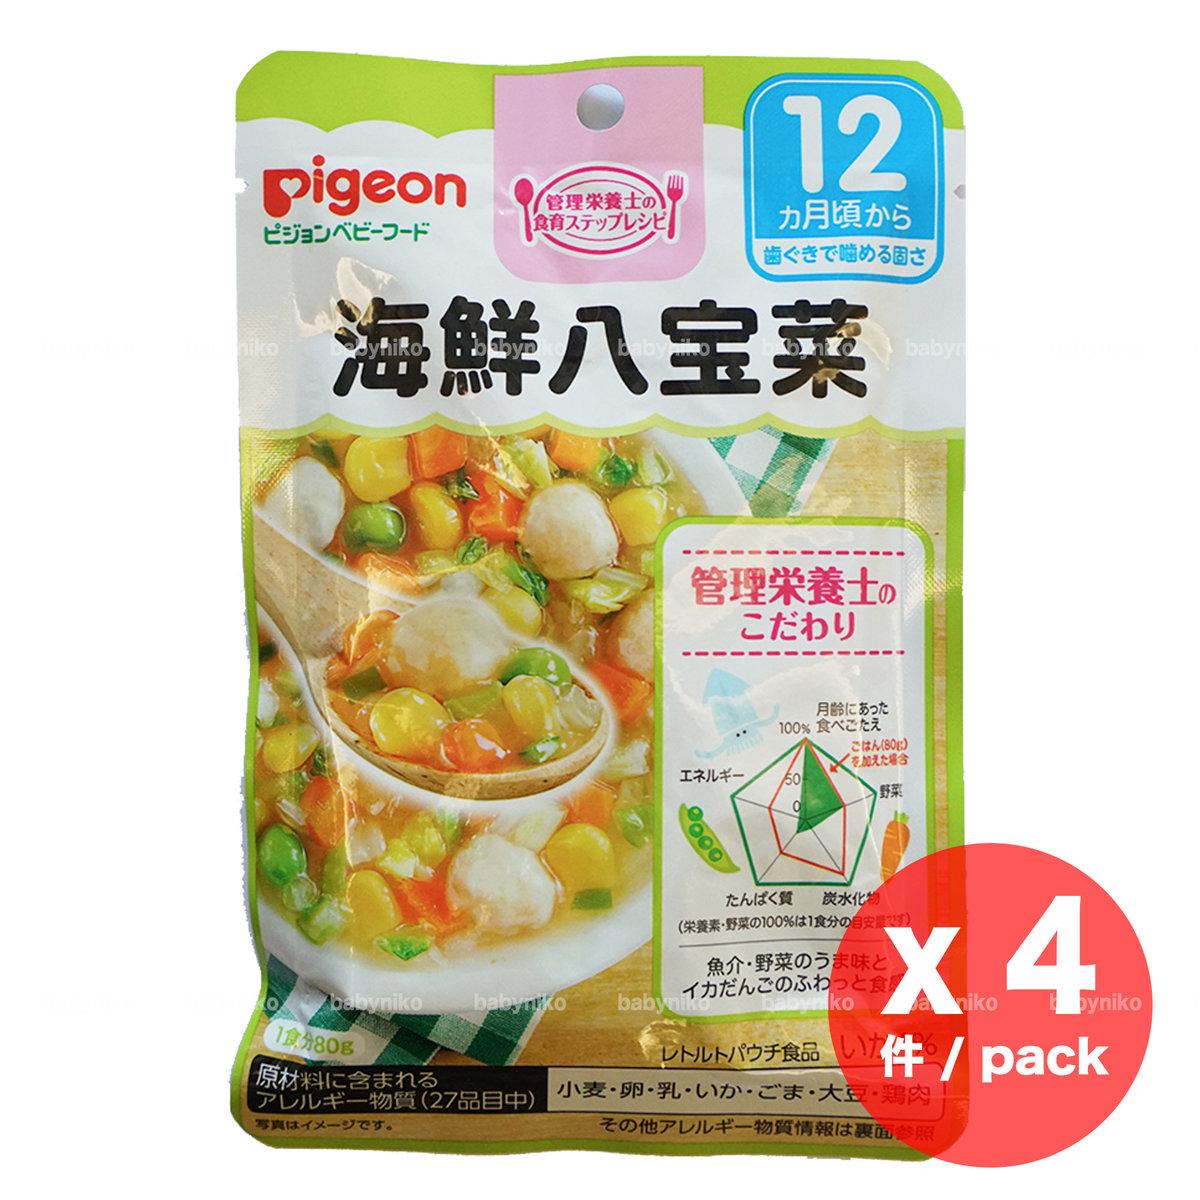 Pigeon嬰兒營養餐 海鮮八寶菜 80g x 4包